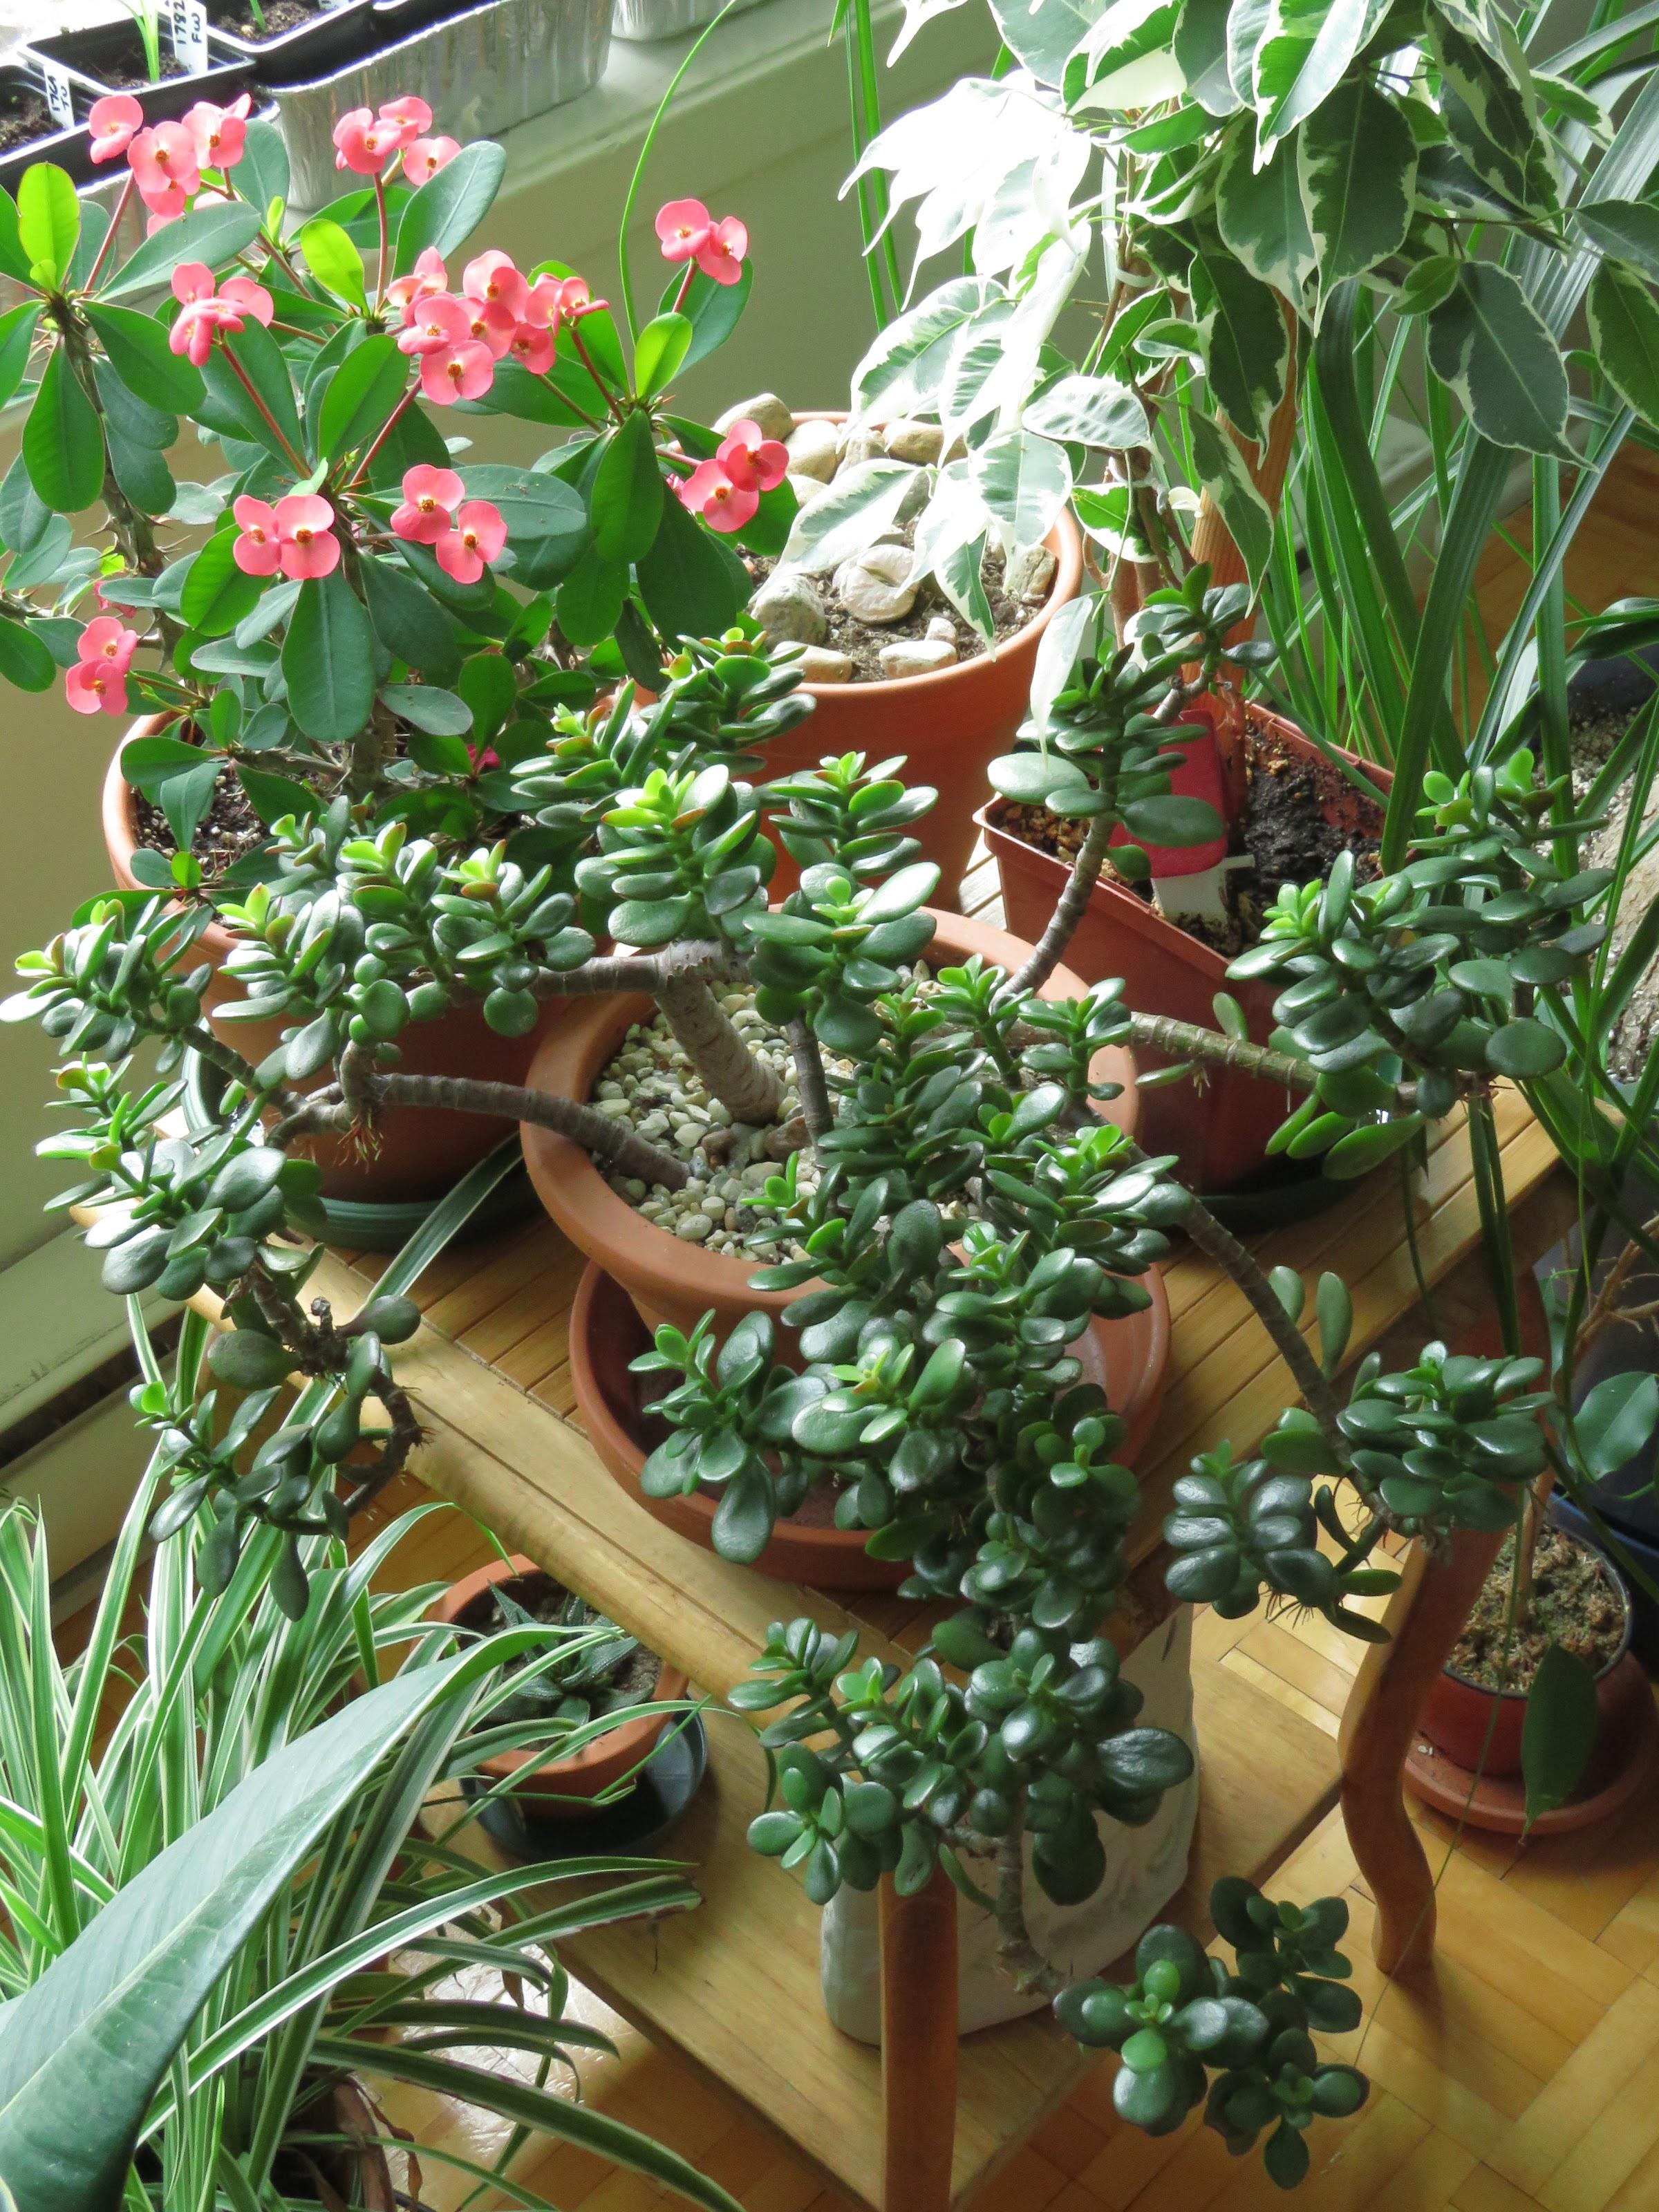 Mes petites plantes grasses et cactées - Page 4 JCUjRcdOfQJ2Gw5nlgyC0H4IruduFfP77Wk3L6LhBuqP0nm5VUPpLsEWrTd84PqTsn3WDE2qzCbcOKaHFscs0Vif7J-lqQOuUpwF3O6P6_V0vxy2aIR-093iba9Zpl2v-NuGeSSsepE=w2400